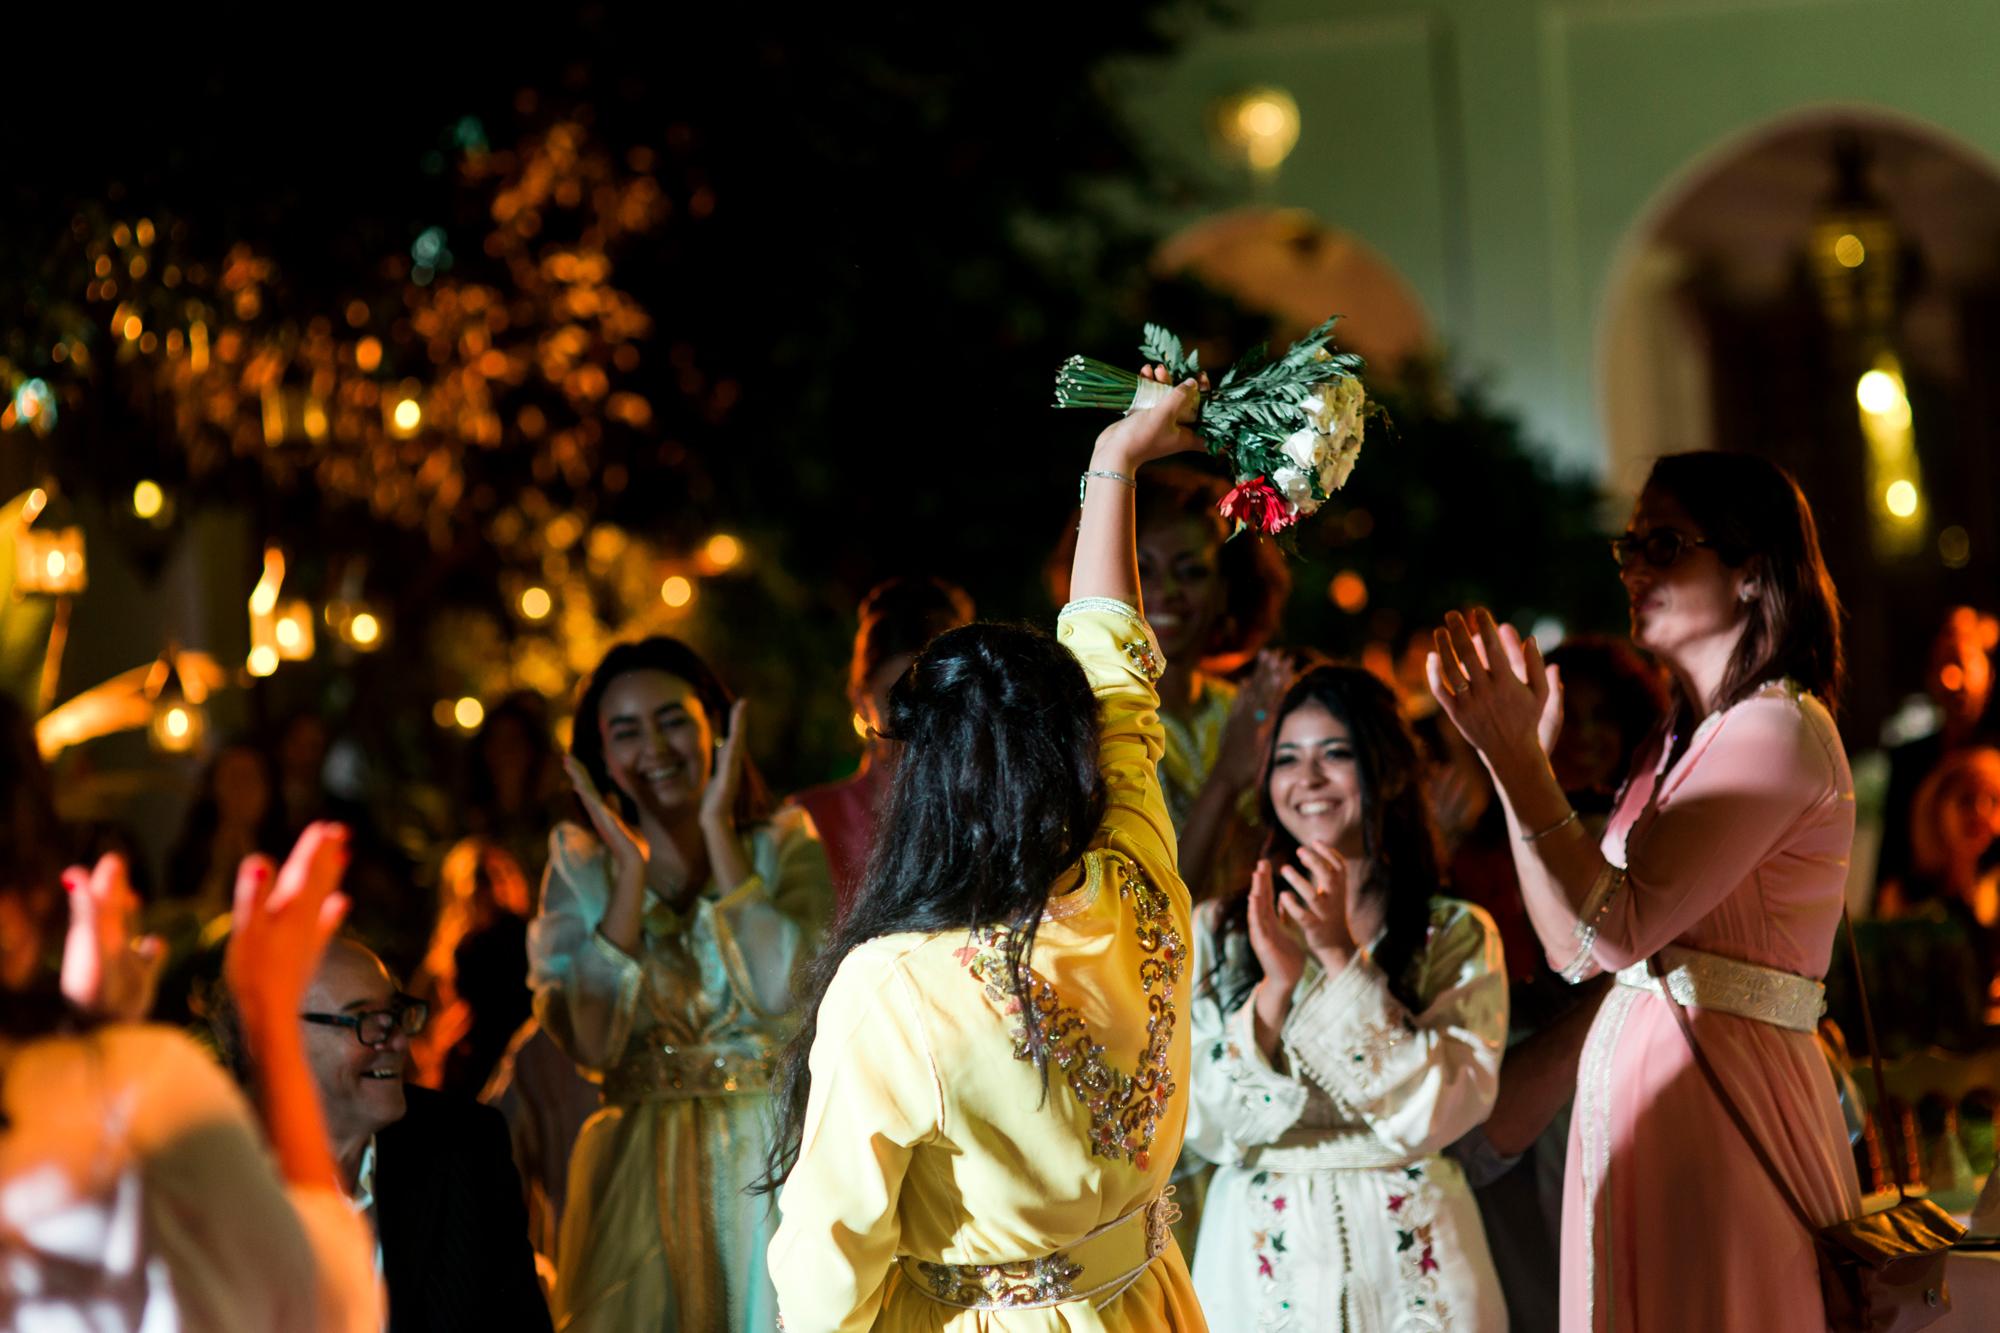 marrakech-morocco-destination-wedding-lilouette-57.jpg